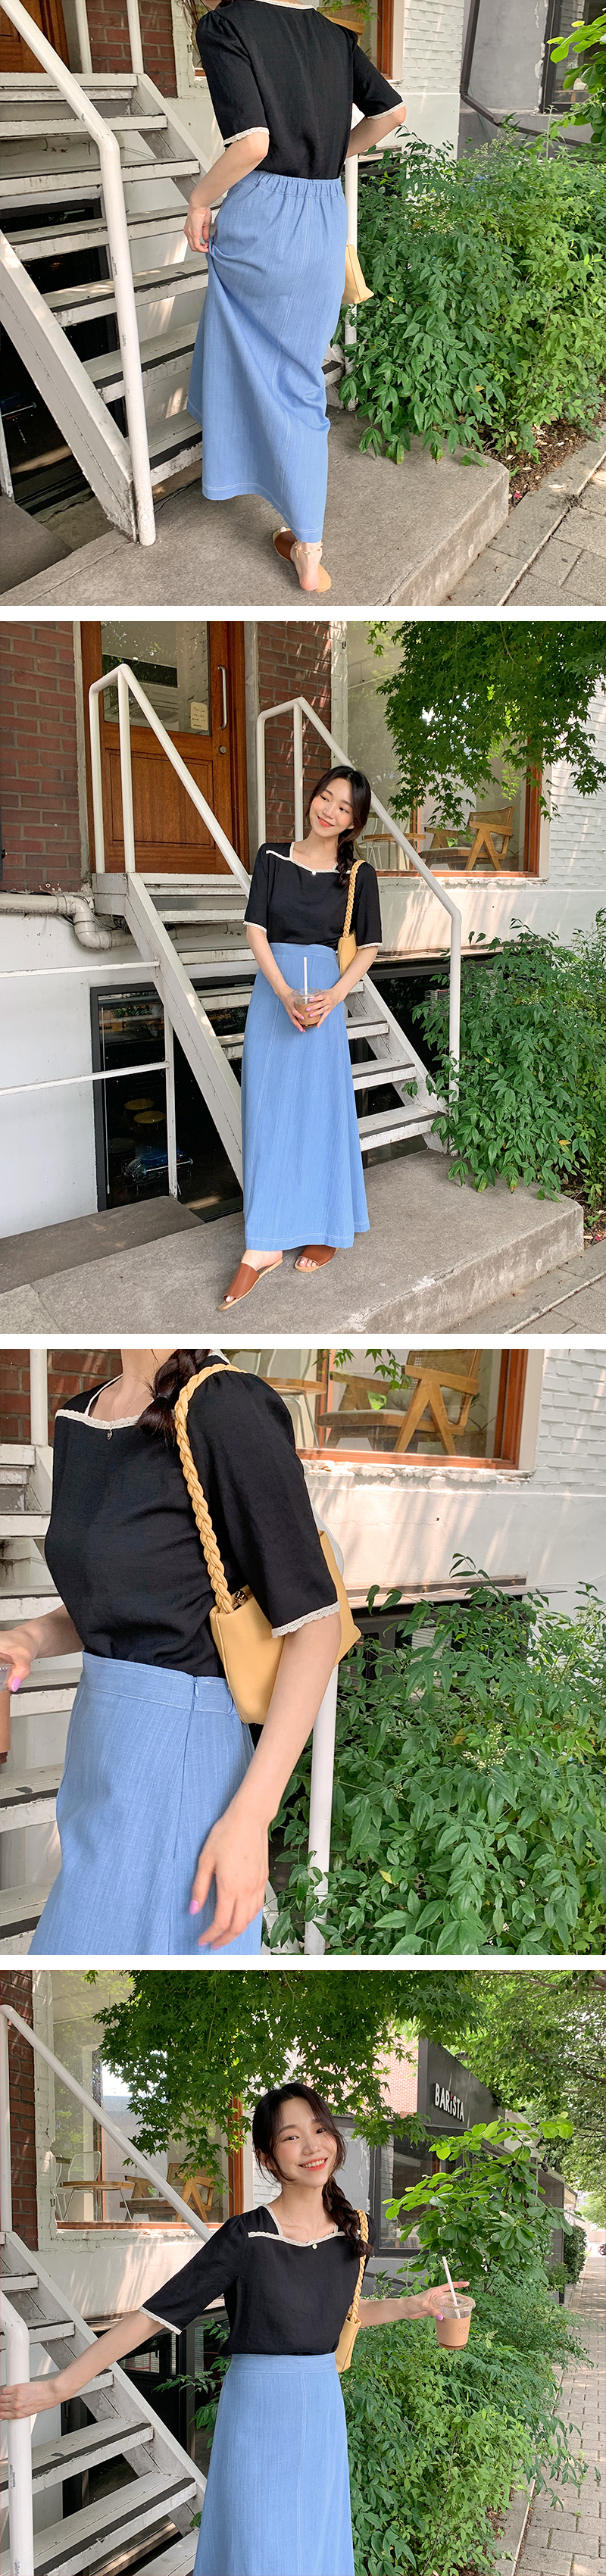 Little Prince Pendant Chain Necklace